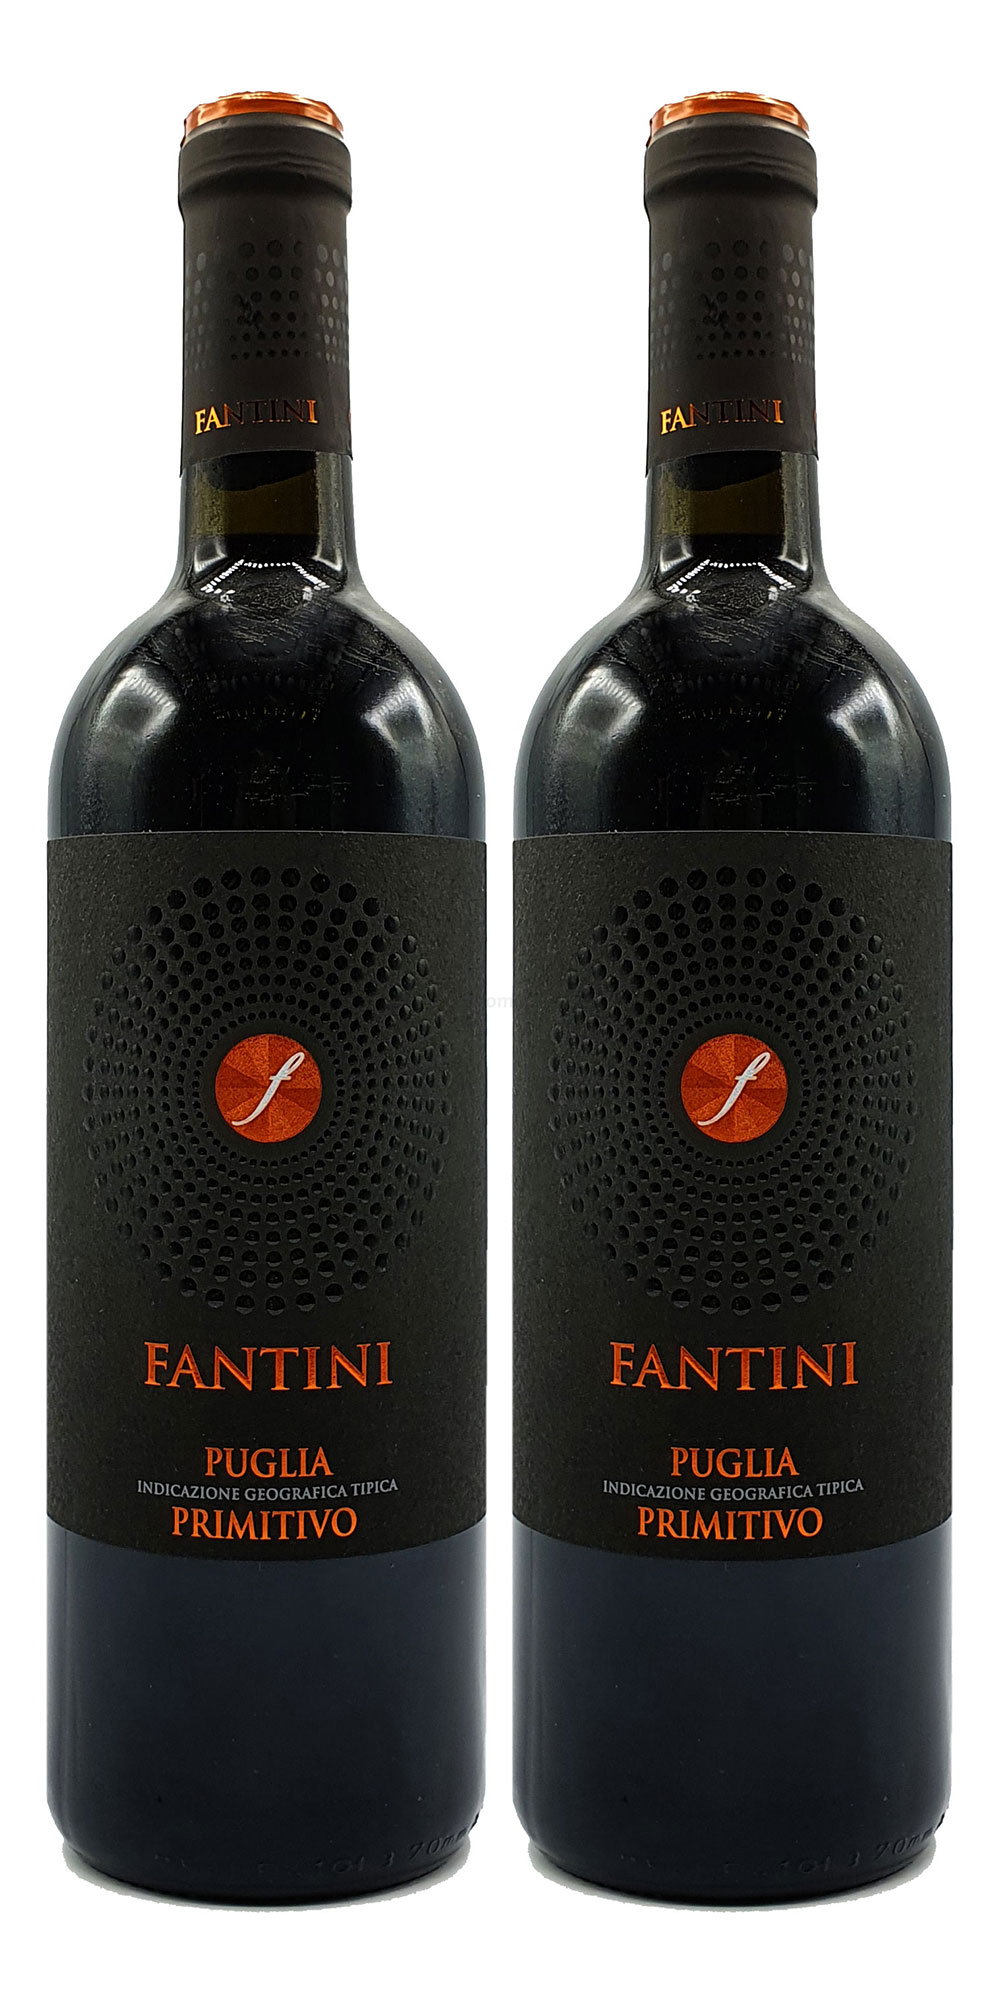 Farnese Fantini Puglia Primitivo 2er Set Rotwein aus Italien 2x 0,75L (14% Vol)- [Enthält Sulfite]